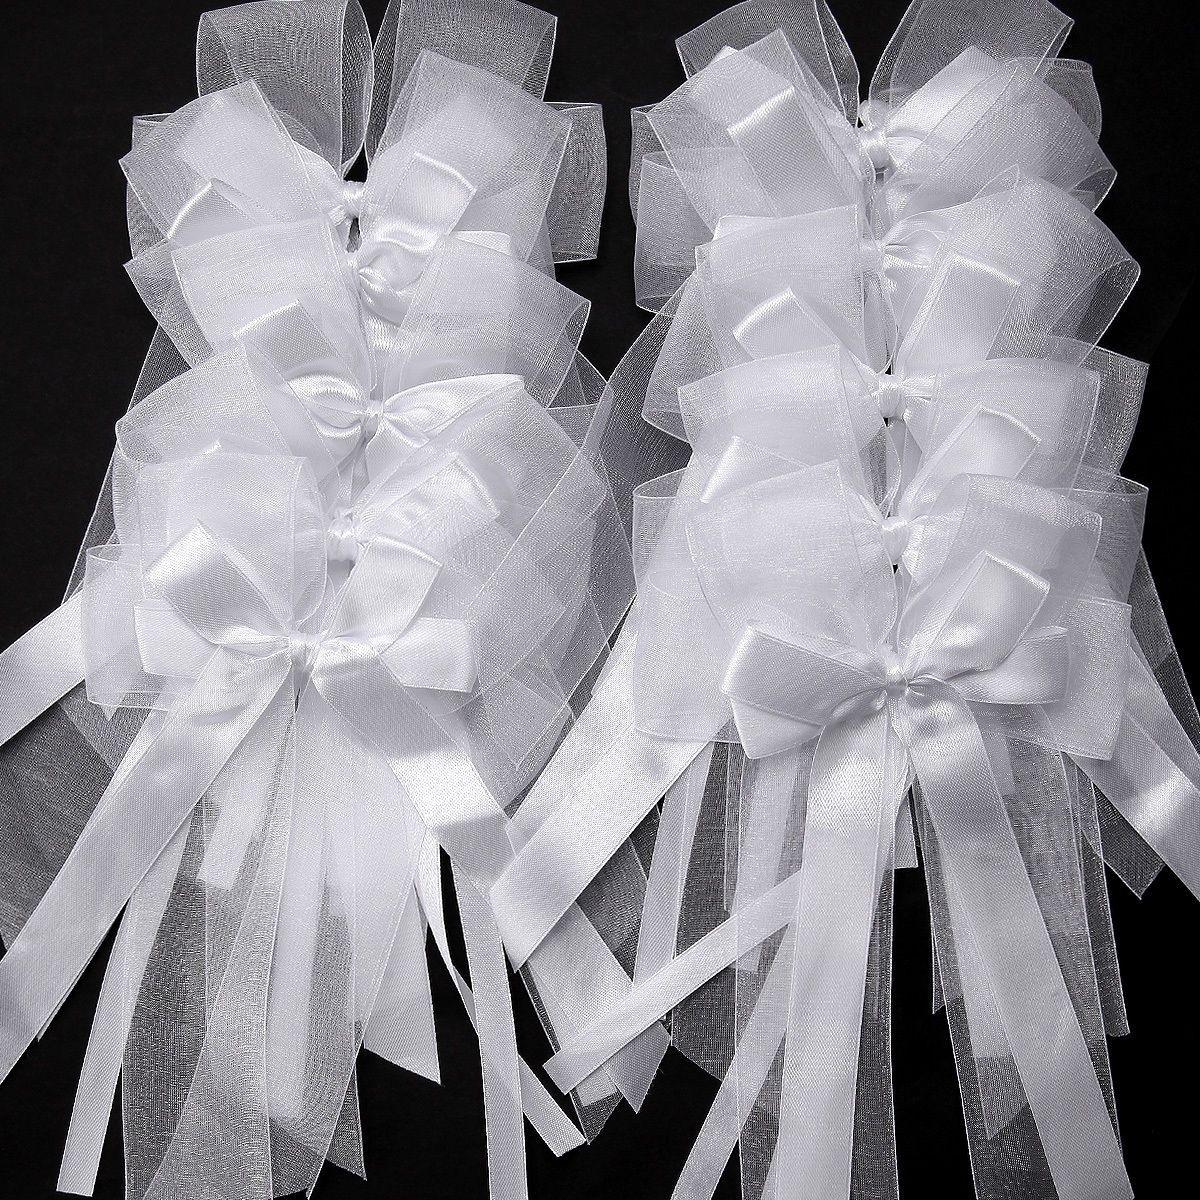 10x noeud papillon ruban satin ruban tulle pr mariage voiture d coration 057 maison. Black Bedroom Furniture Sets. Home Design Ideas